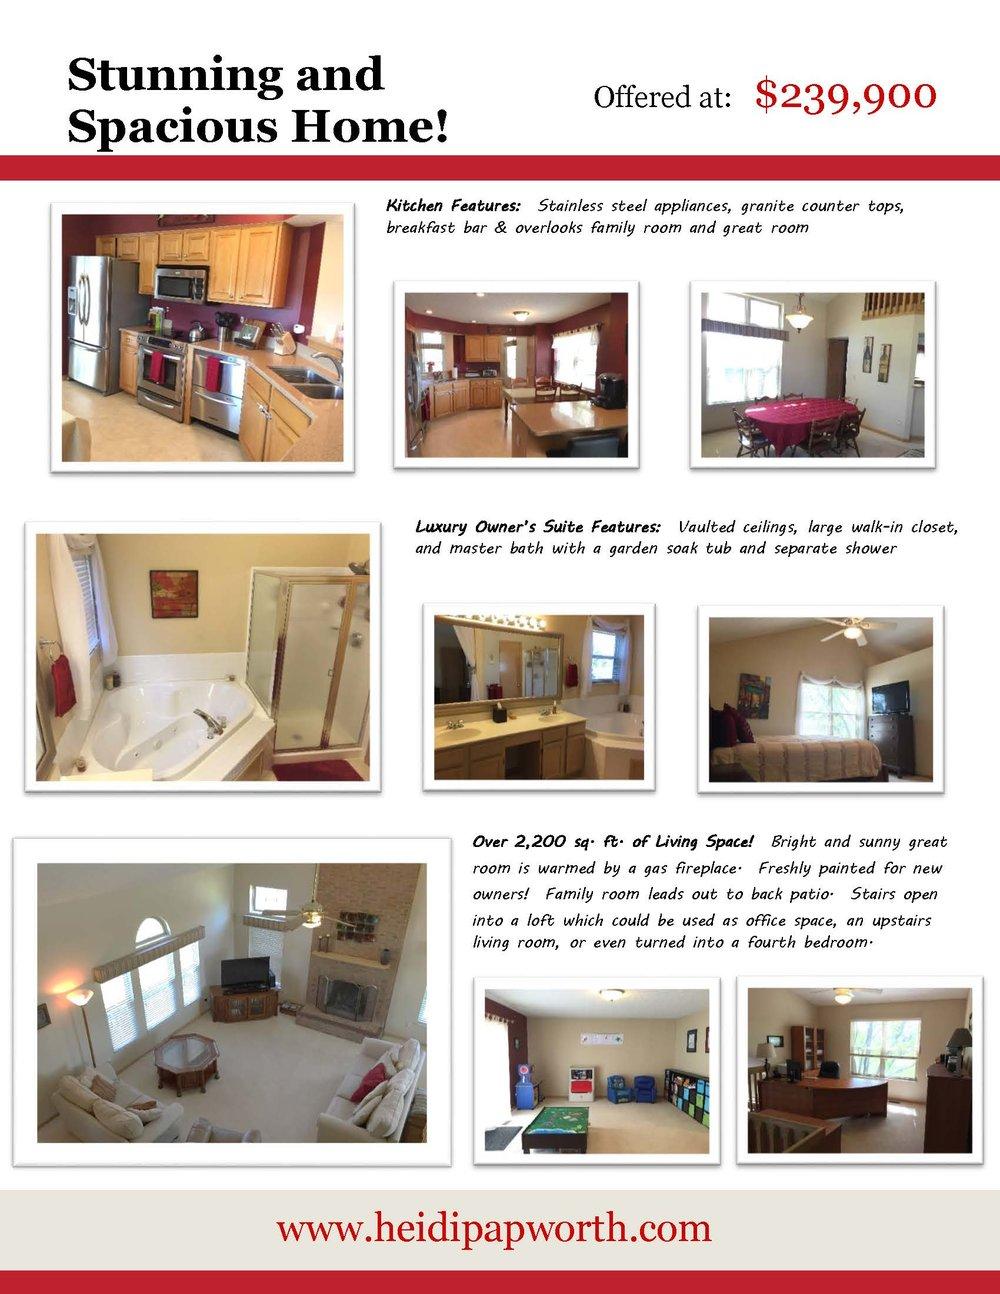 PropertyFlyer_4pages_092414_v2_Page_1.jpg